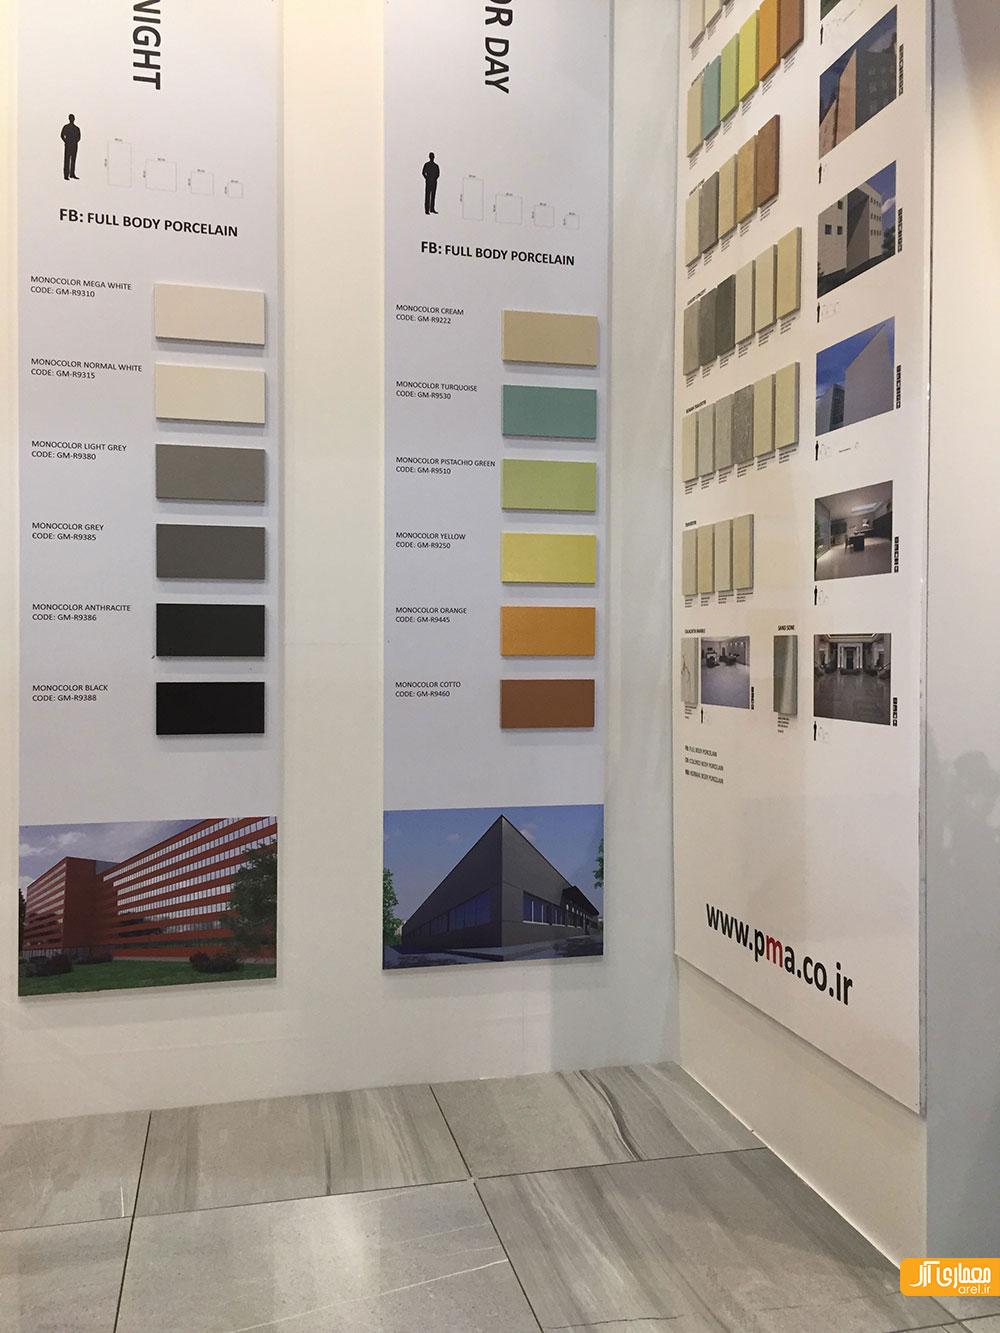 گزارش آرل از هفتمین نمایشگاه بين المللي معماري و دكوراسيون داخلي میدکس